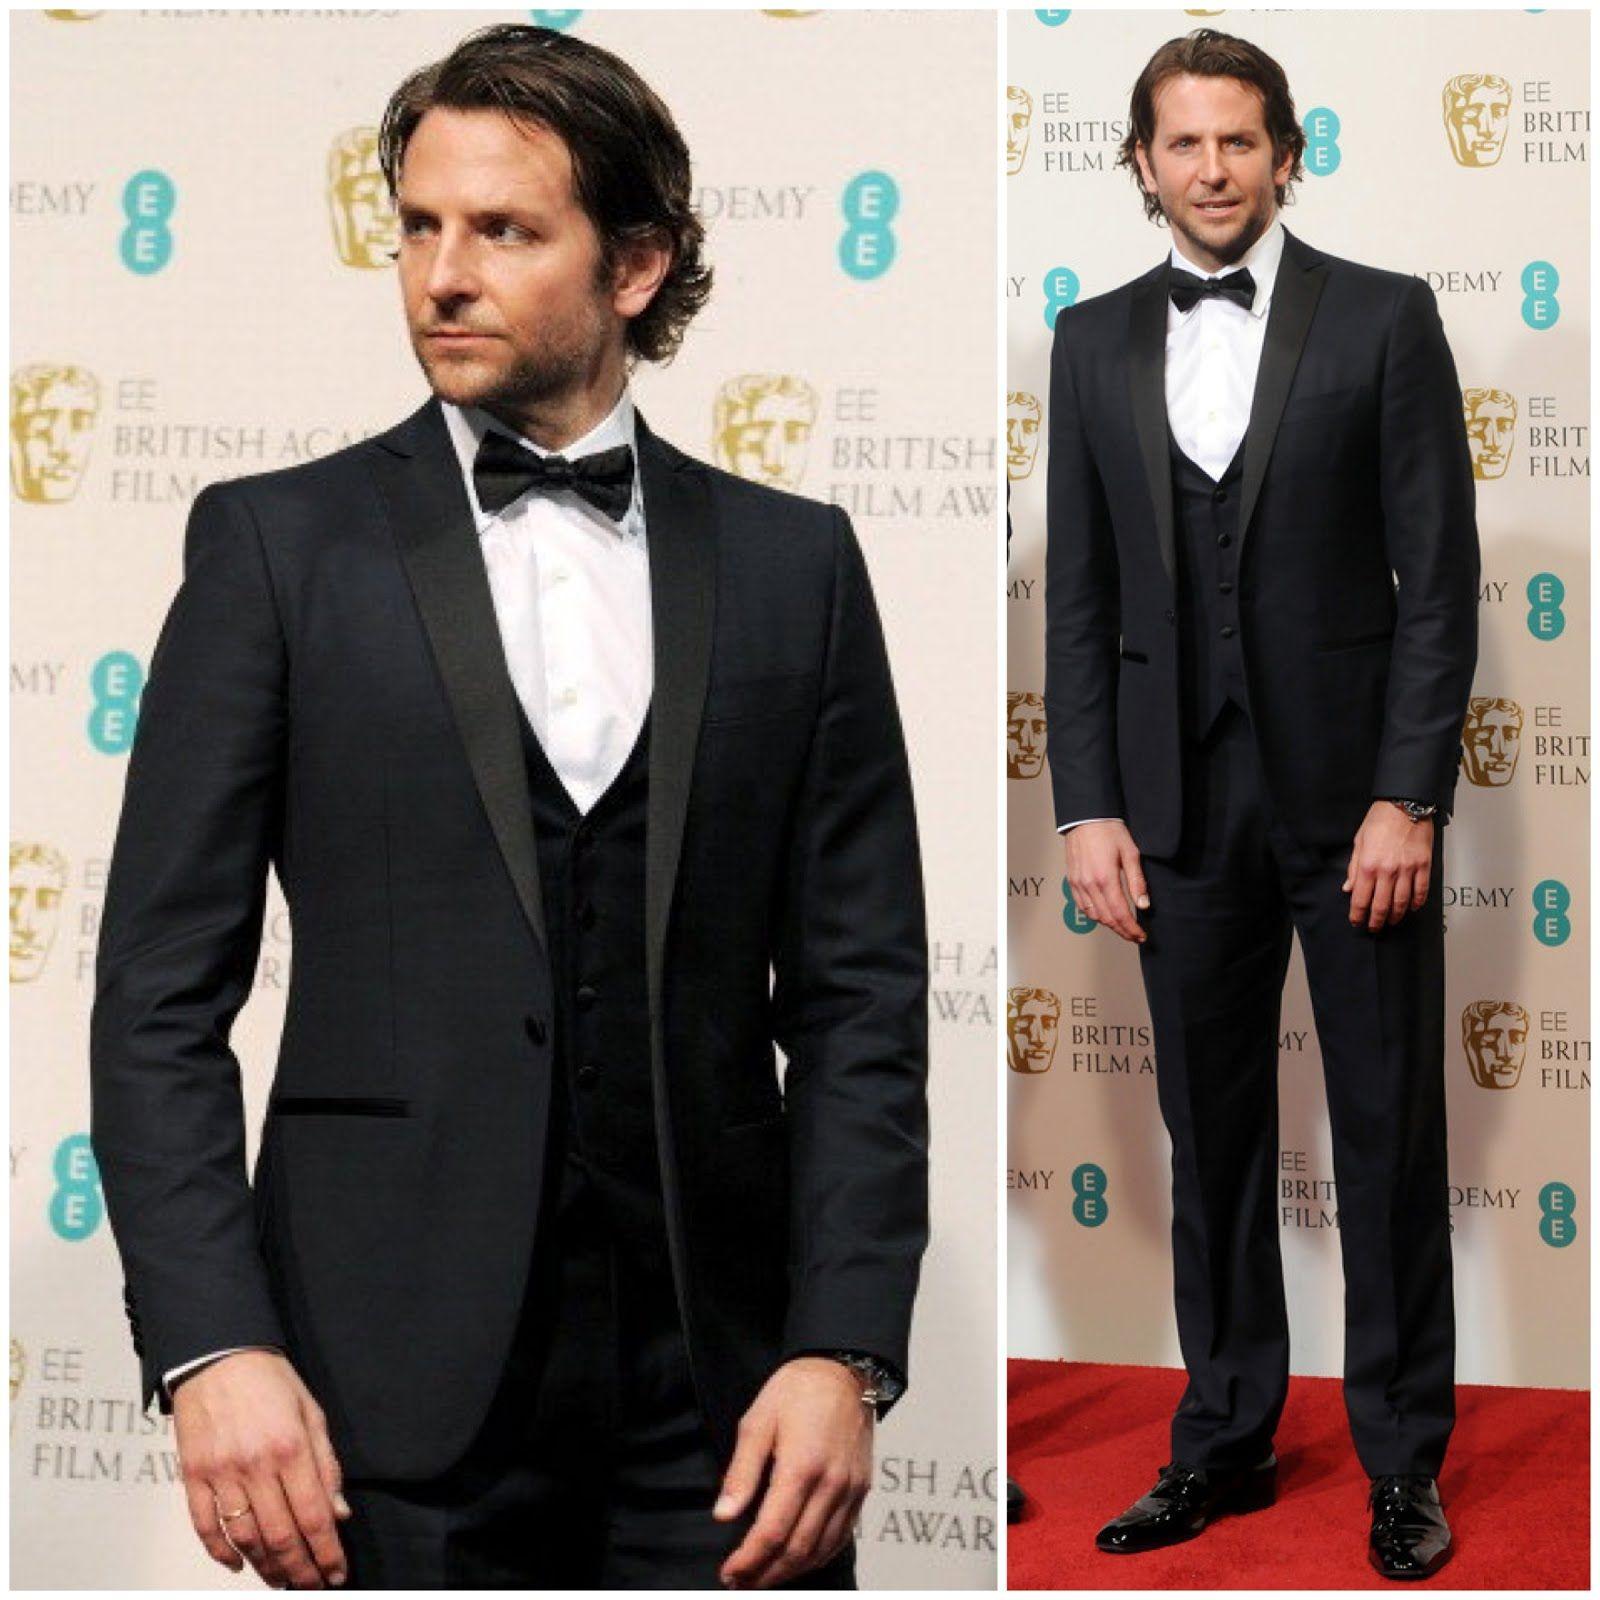 bf429ac5916fb What s he wearing   Bradley Cooper in Salvatore Ferragamo - 66th ...